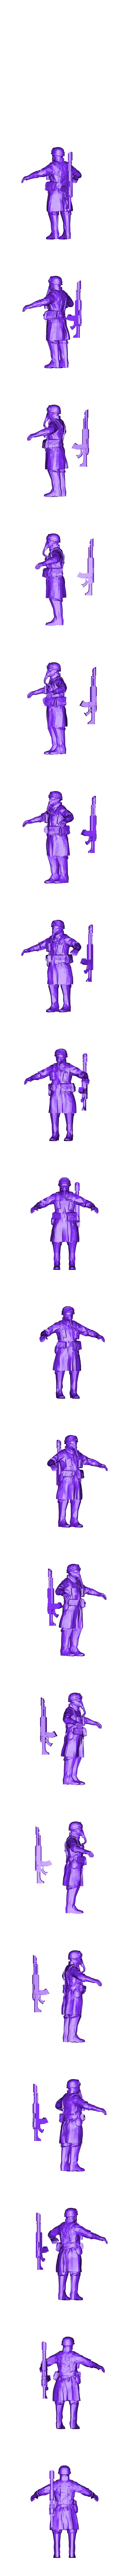 ThatEvilOnes_Printable_Steel_Legion_Trooper_Base.obj Download free OBJ file Community Guardsmen Project Hub • Design to 3D print, ThatEvilOne